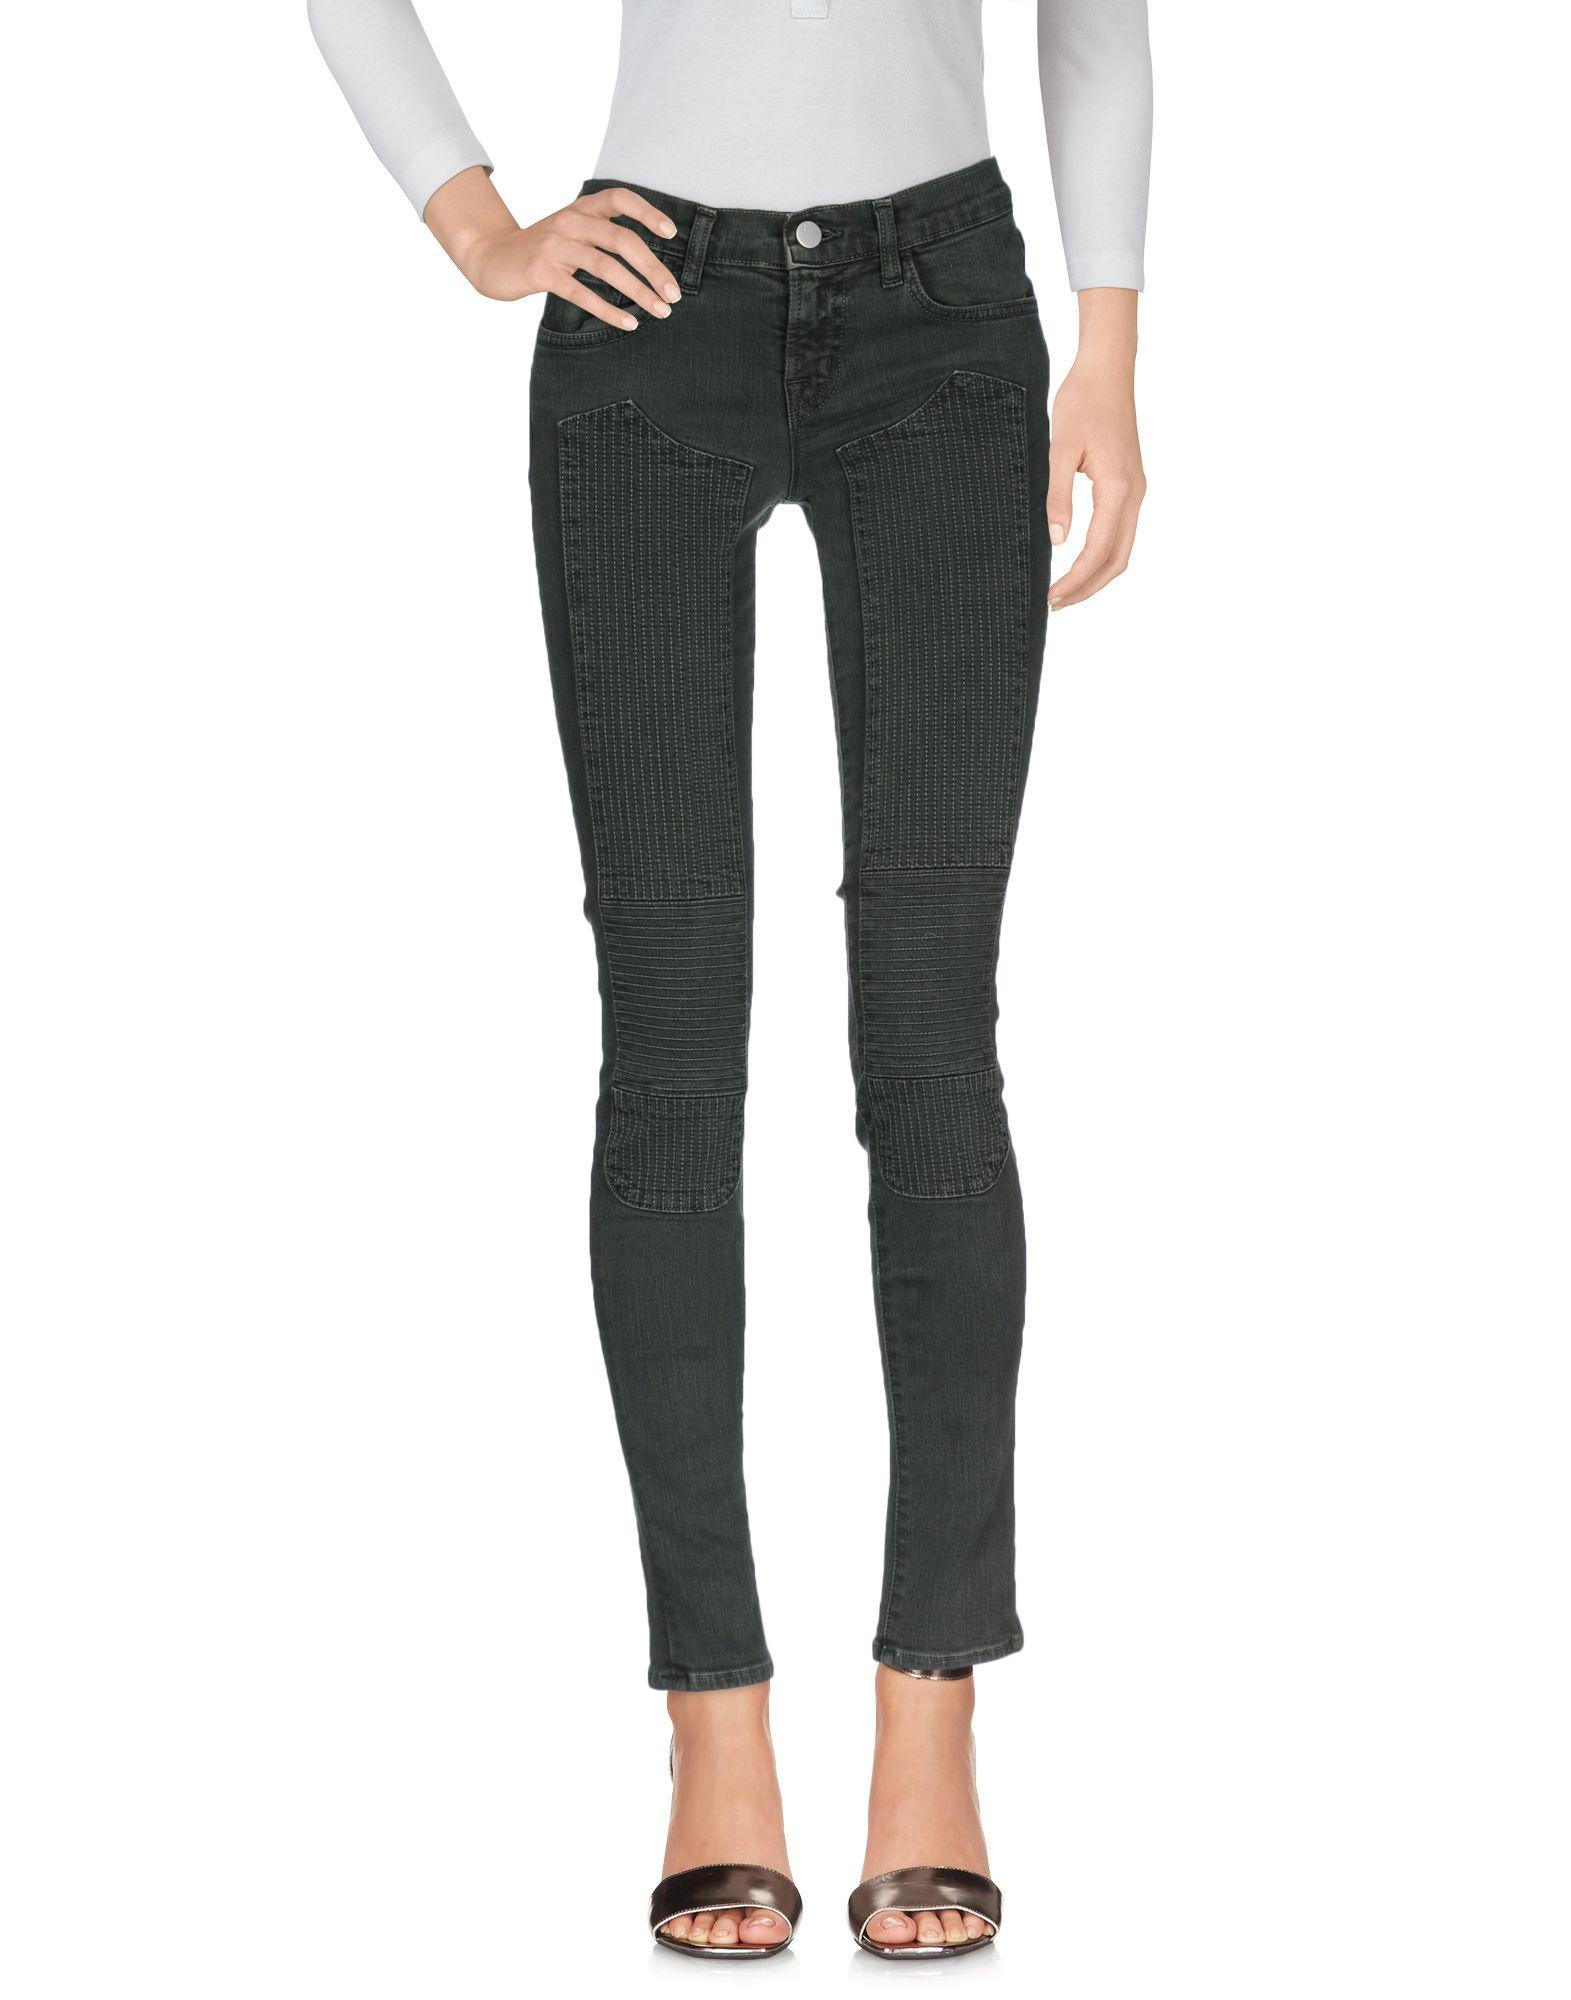 Pantaloni Jeans J Brand Donna - Acquista online su XGpP9Y65